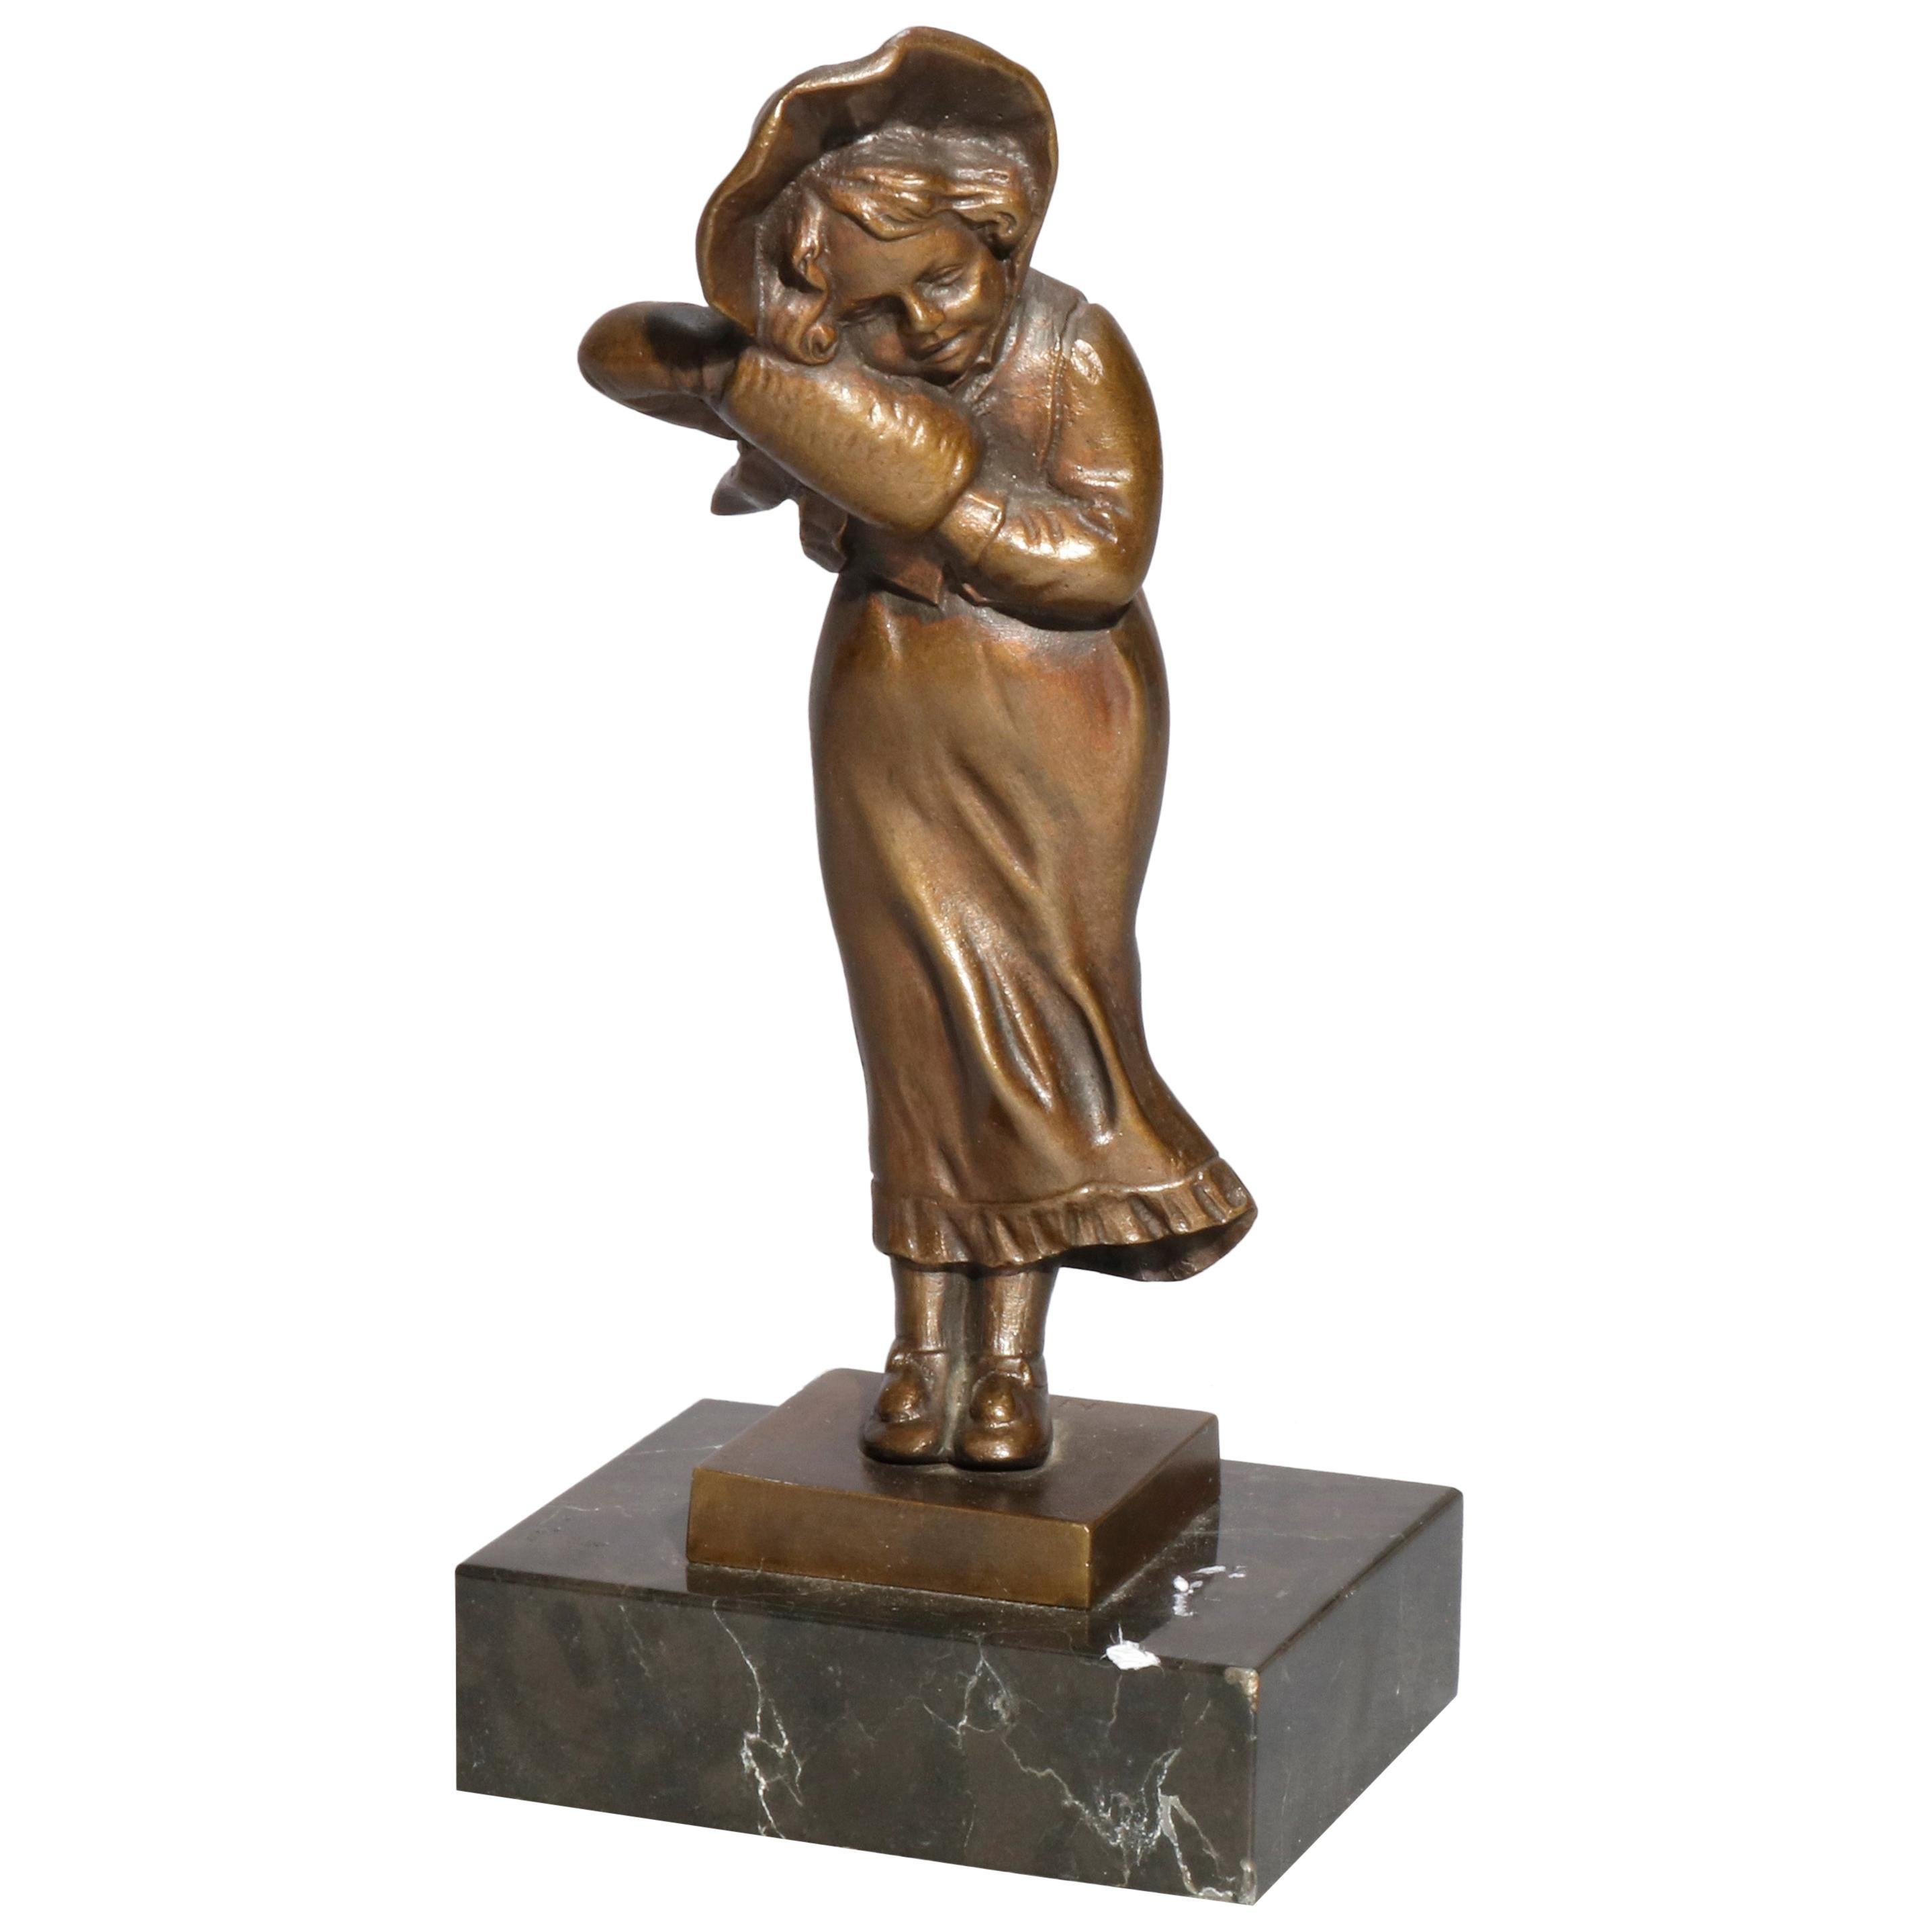 Antique Figural Bronze Portrait Sculpture of Young Girl, circa 1910